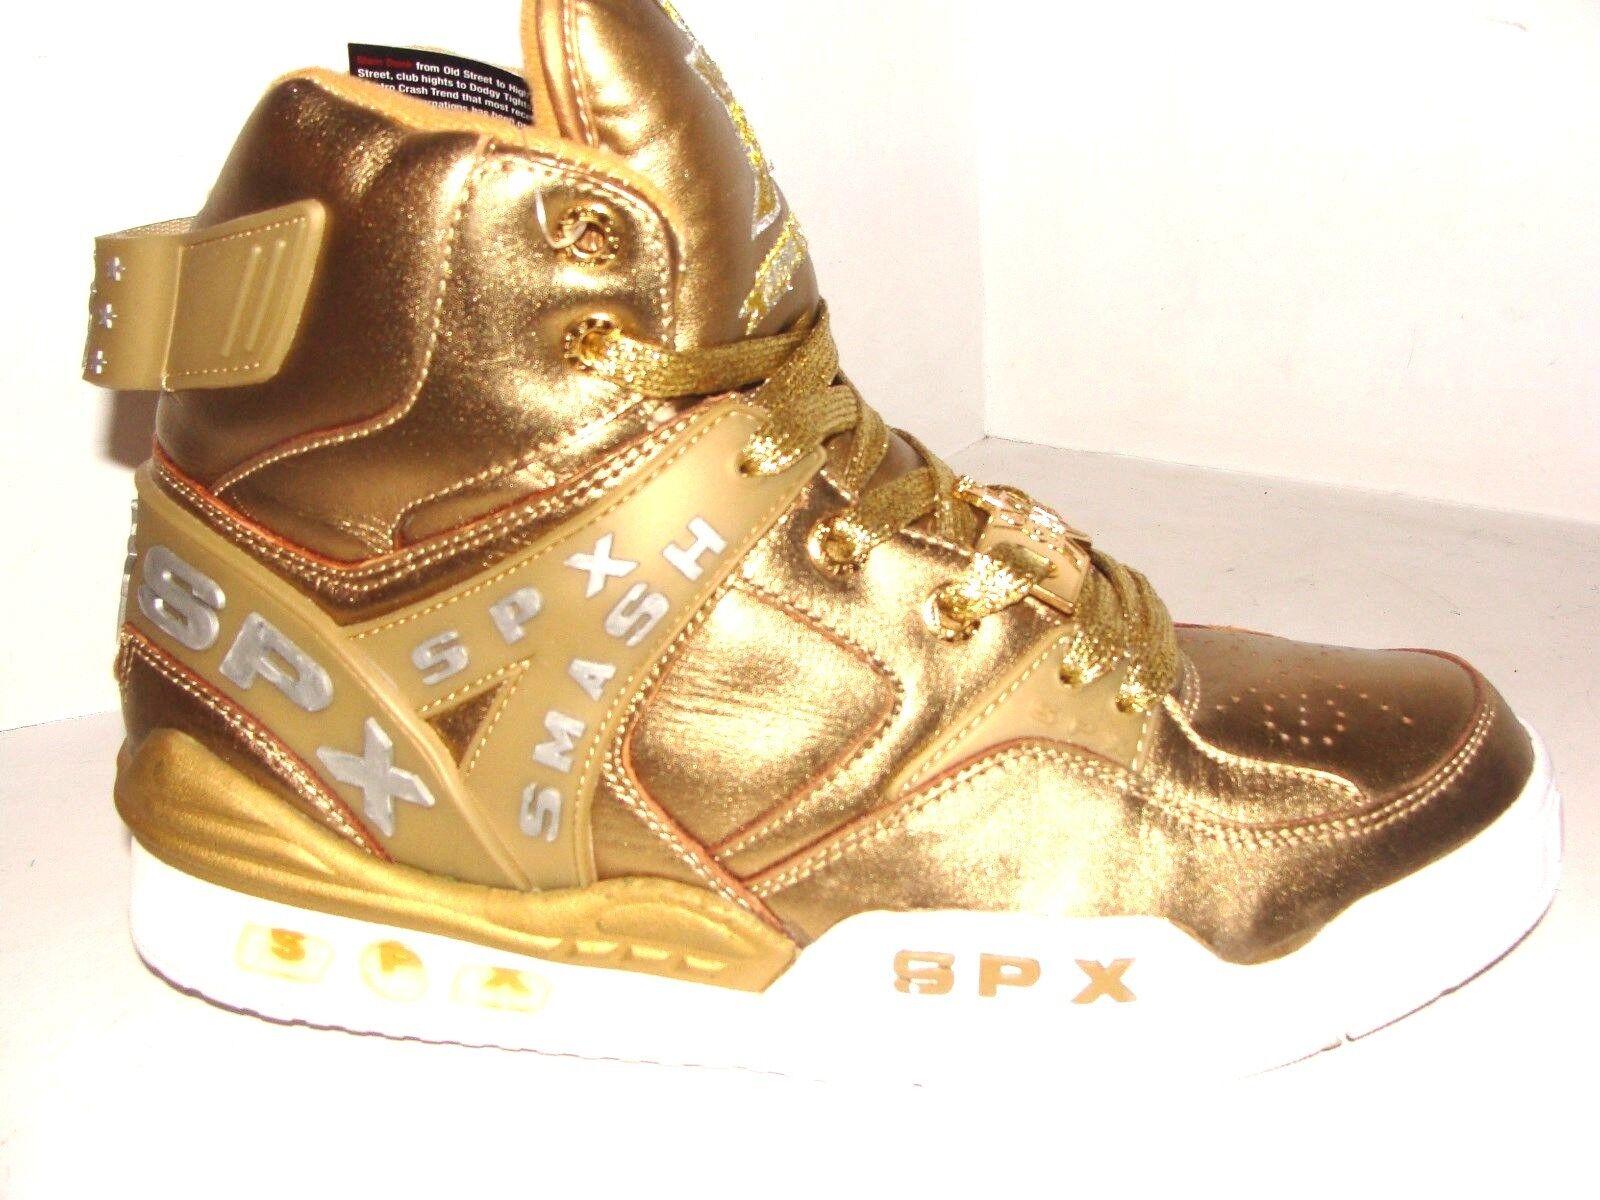 NUOVO SPX scarpe da ginnastica Street Treck Grande  look  online economico